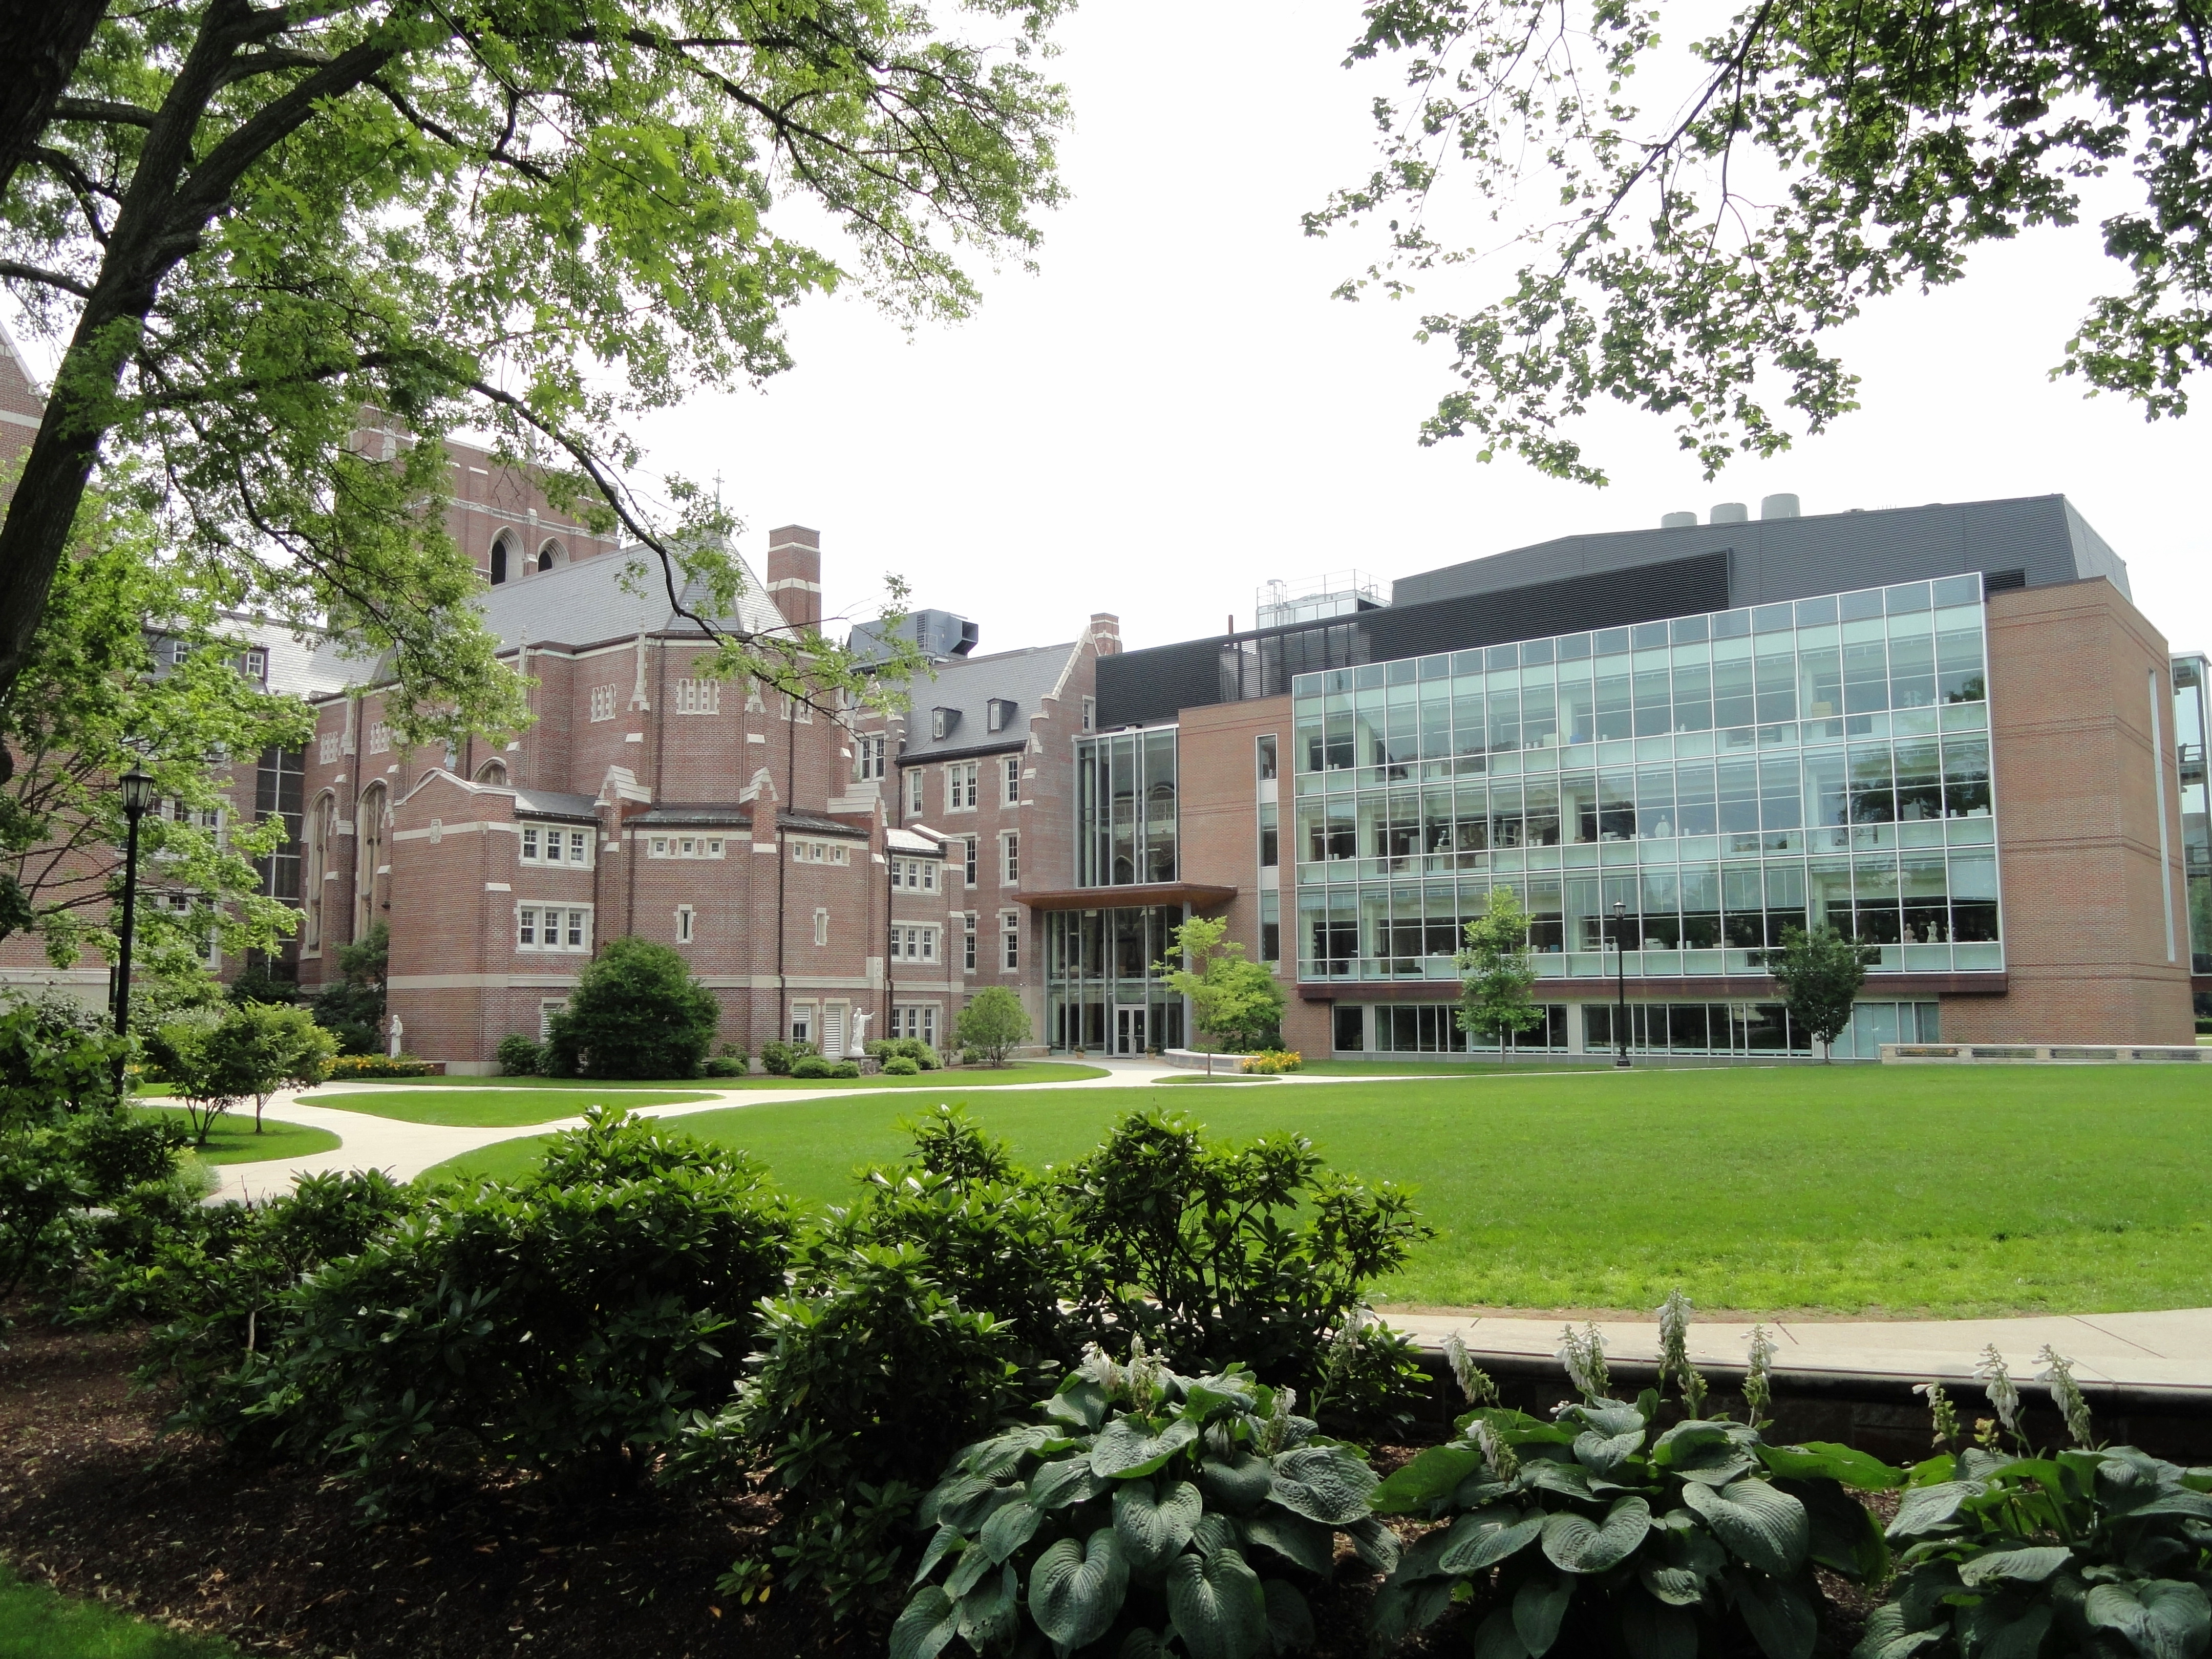 Boston College Campus Visits Tours